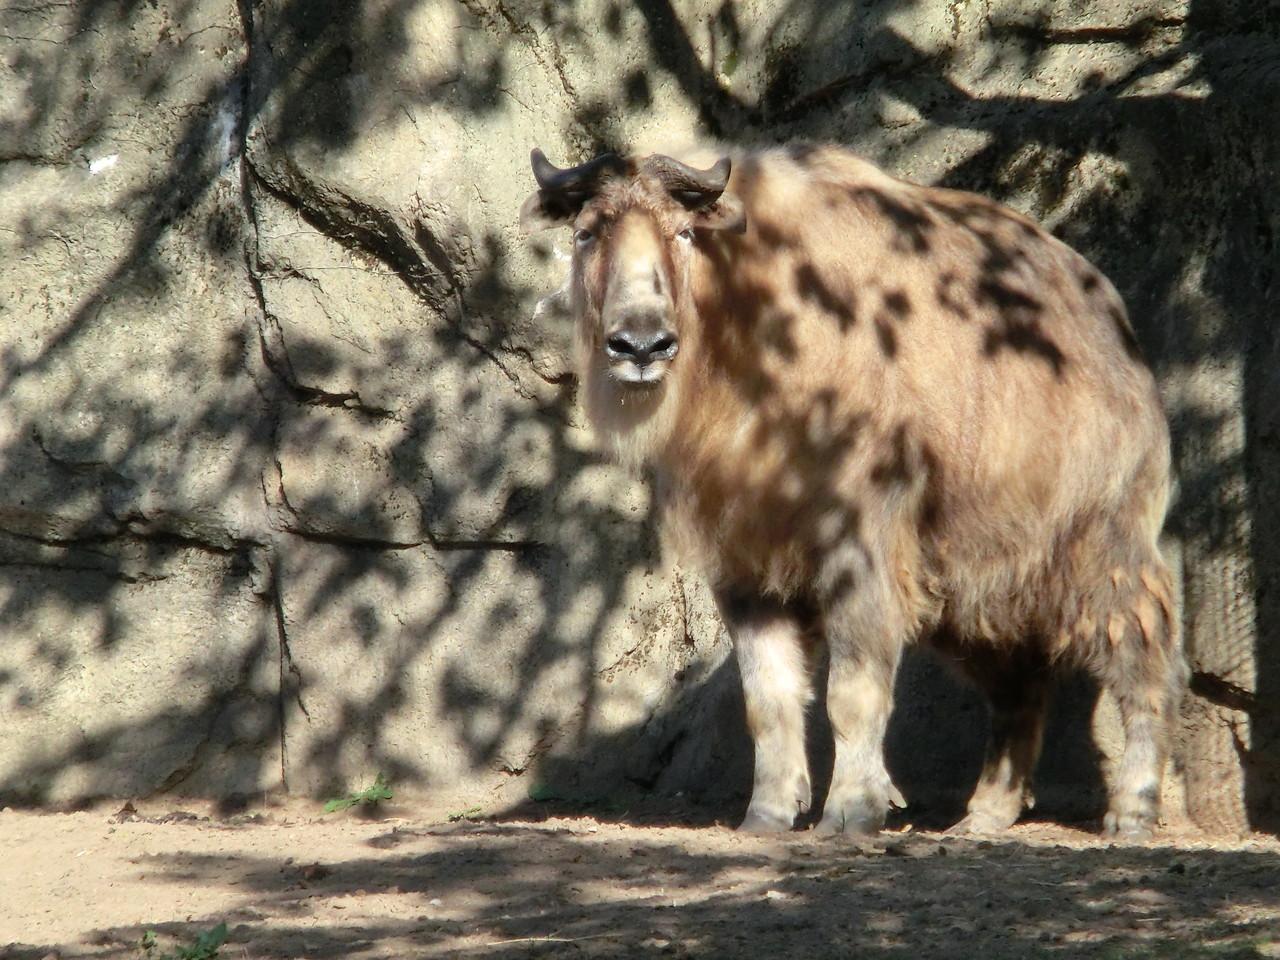 Sichuan Takin - Lincoln Park Zoo - Chicago